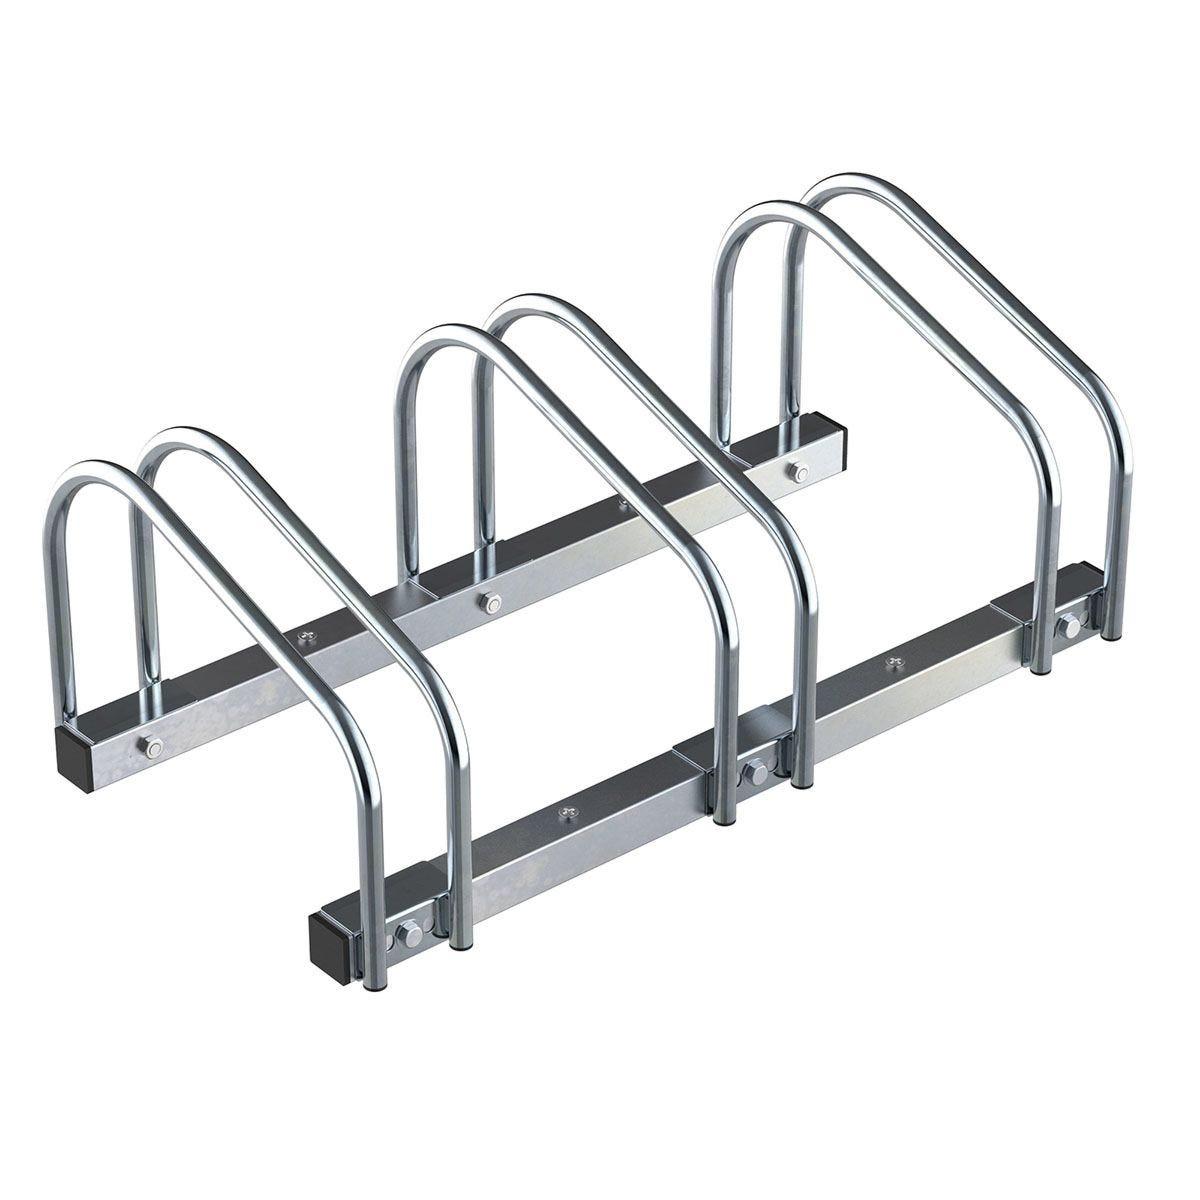 HOMCOM 3 Bike Parking Rack Locking Storage Stand Holder Outdoor Floor Wall Mount Steel - Silver